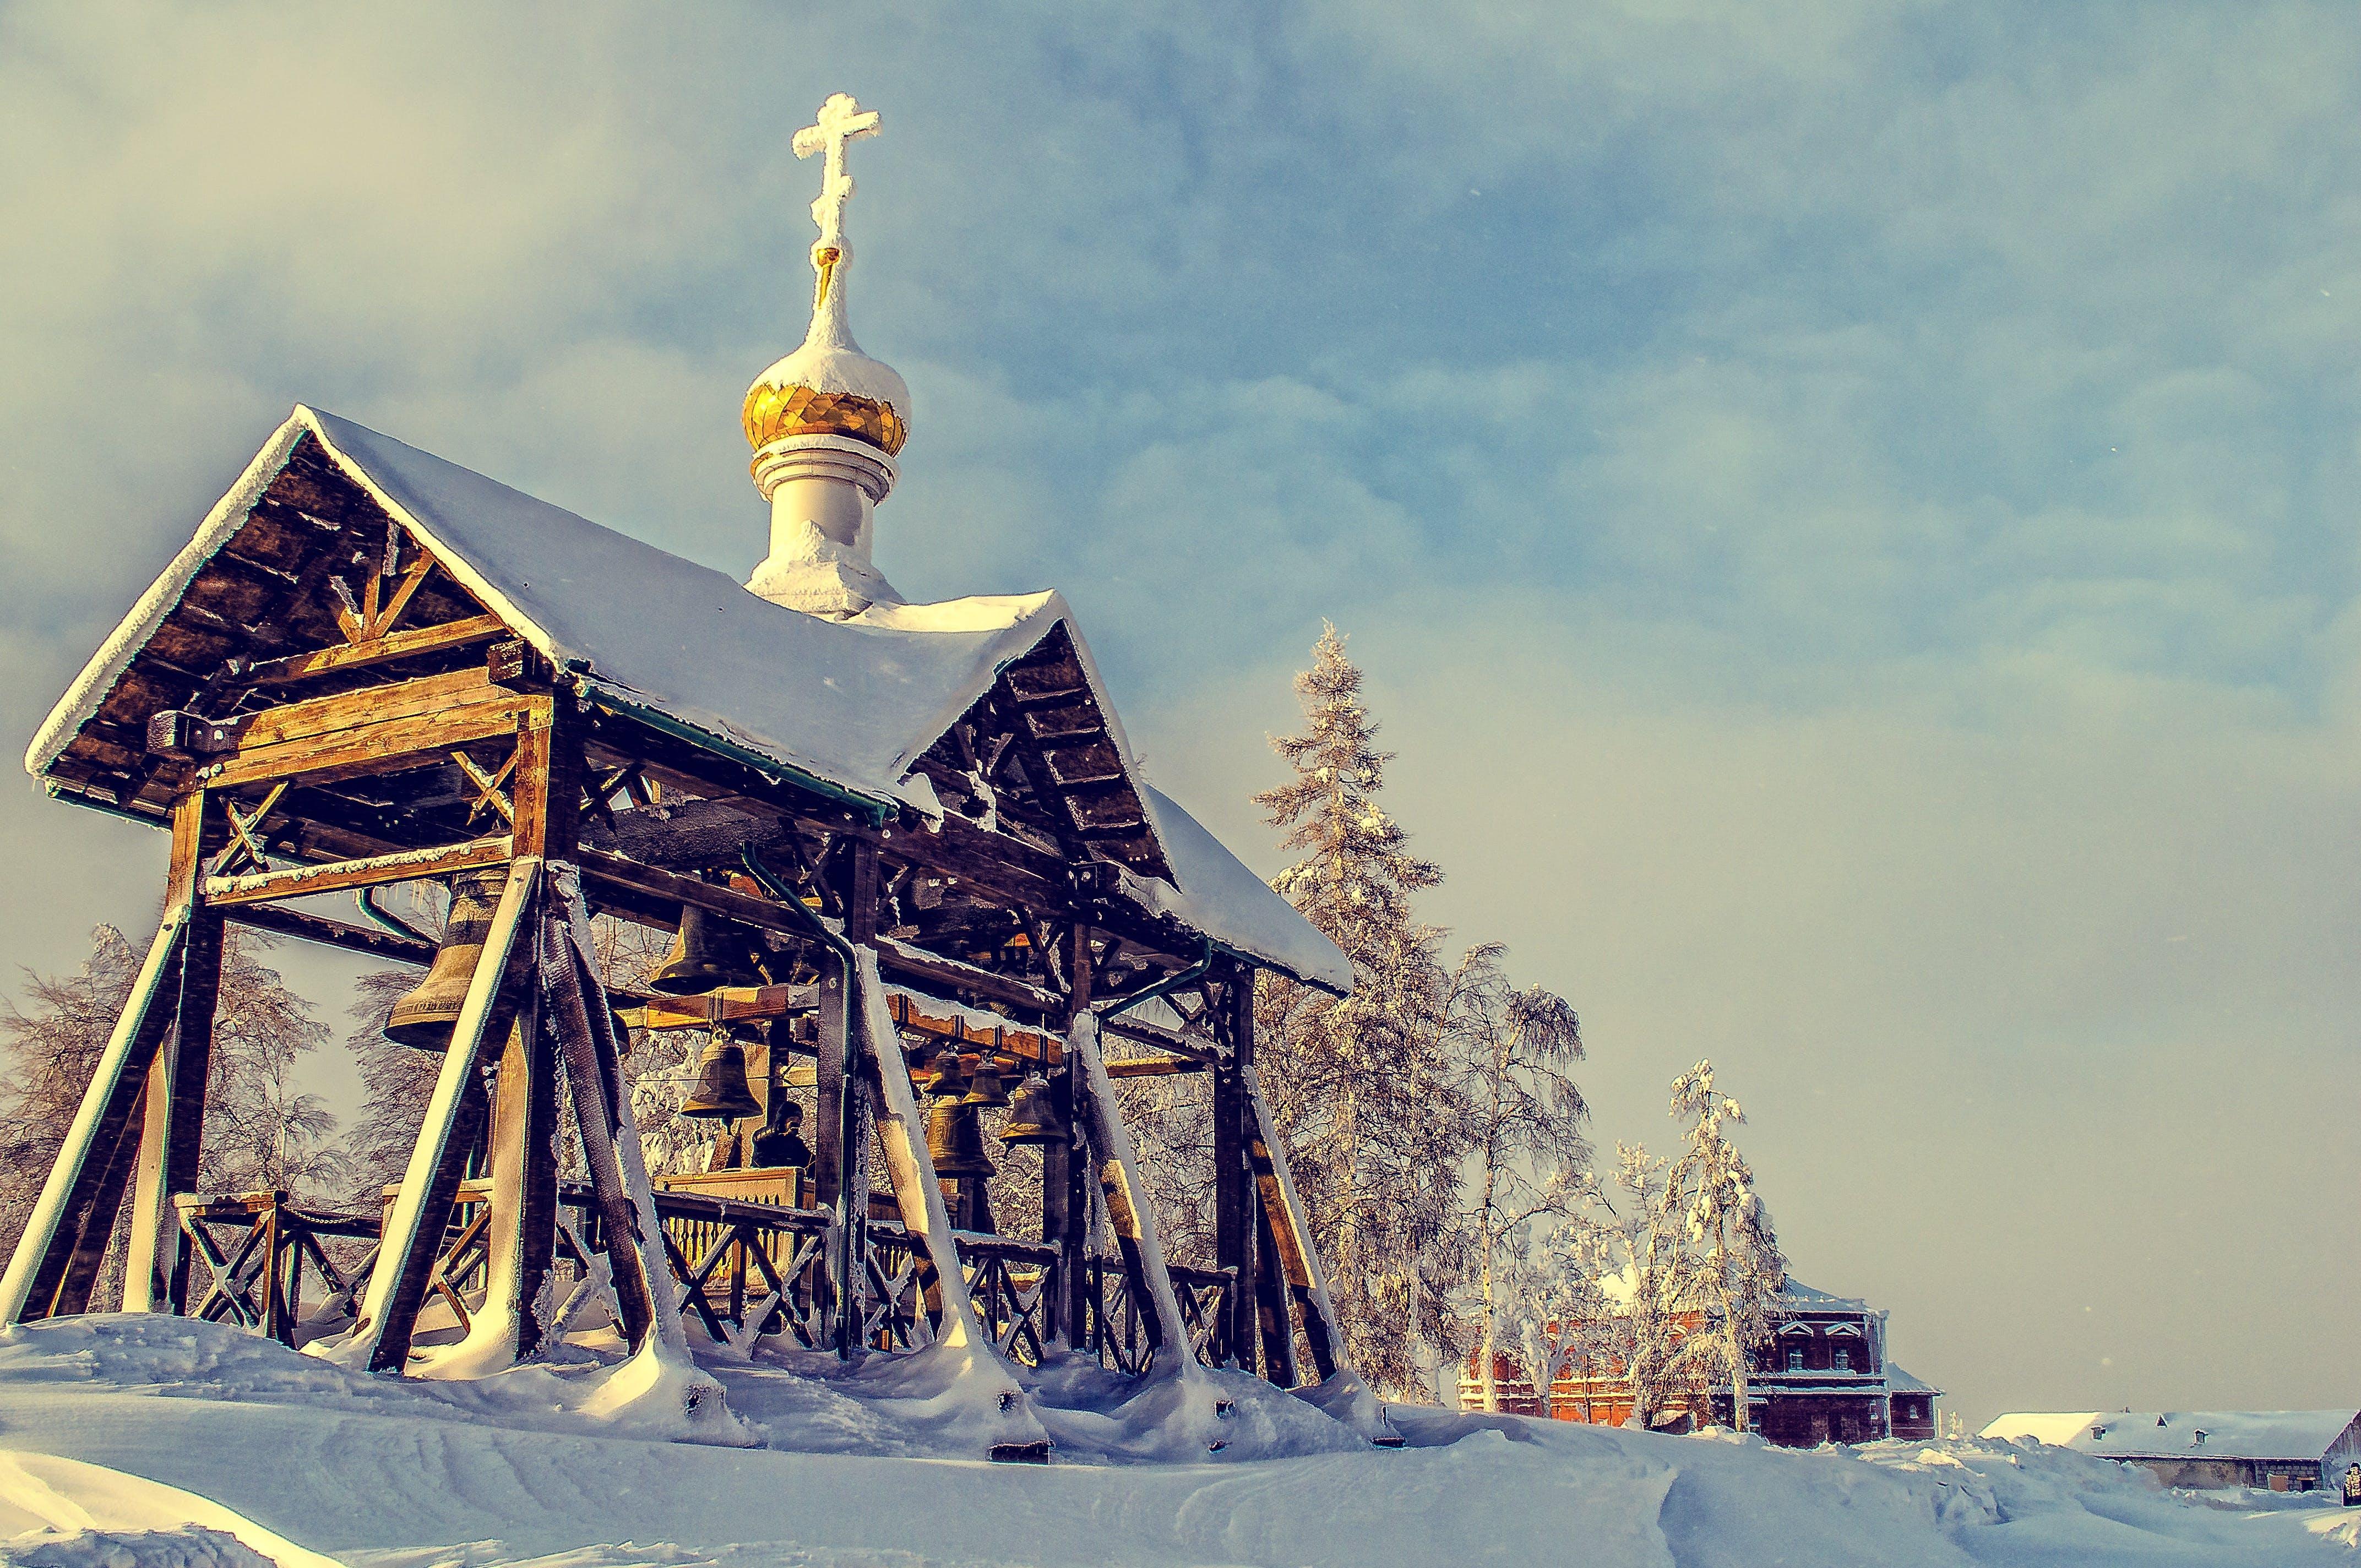 architecture, bells, building